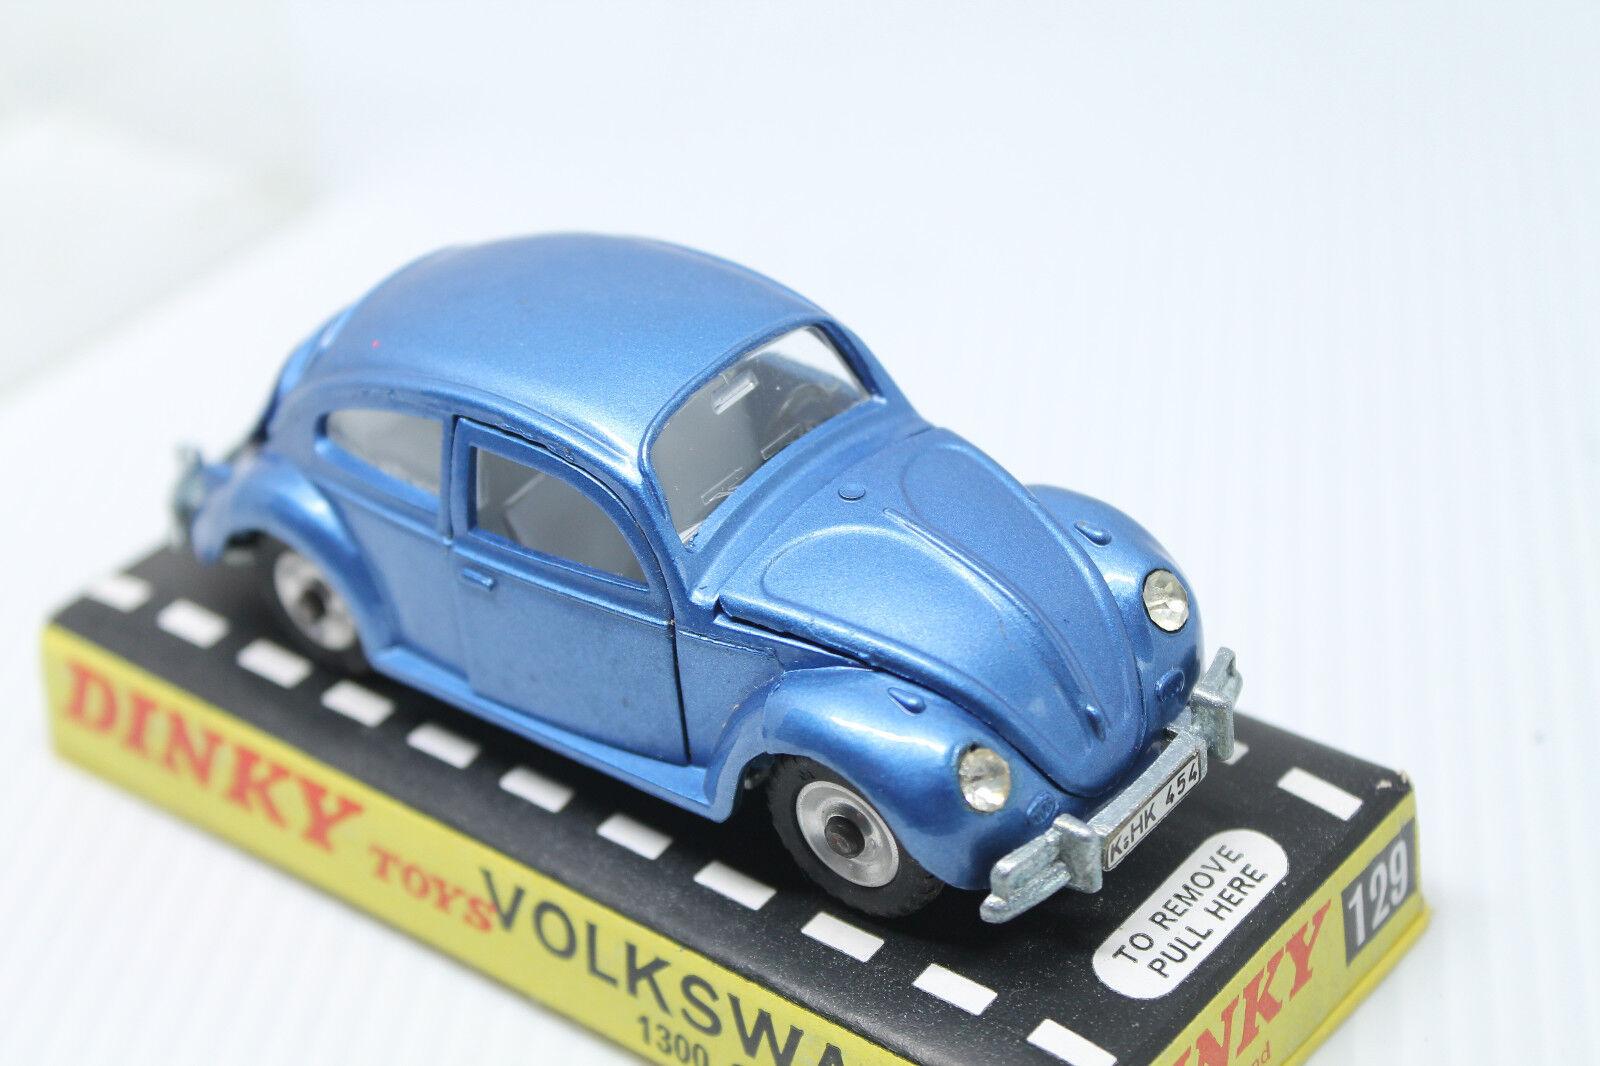 DINKY TOYS 110 * Volkswagen  VW  1300 Sedan MAGGIOLINO * * 1965 * OVP * 1:43